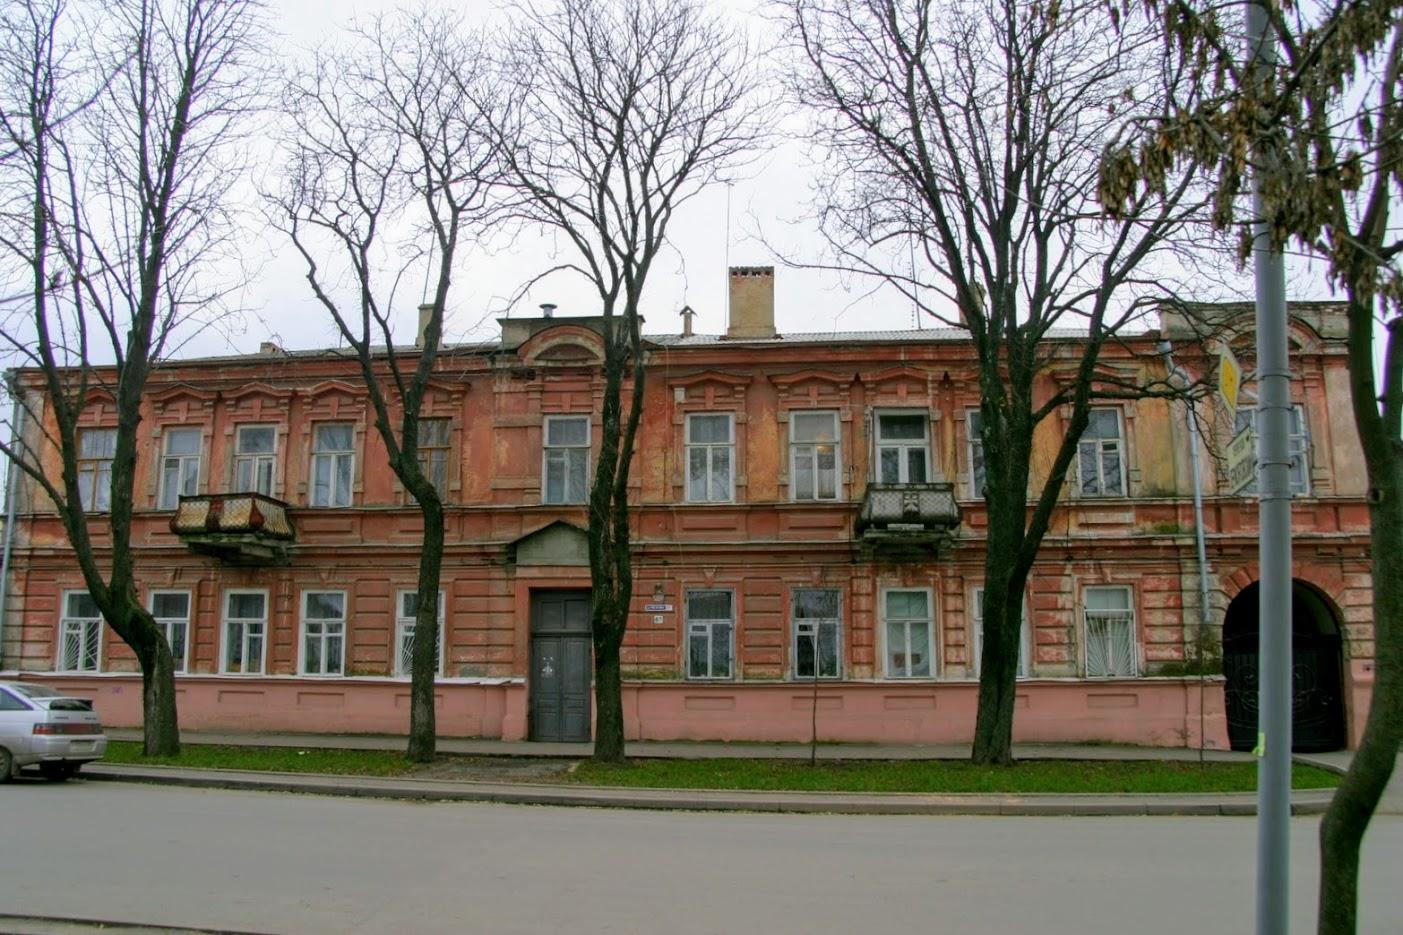 https://sites.google.com/site/istoriceskijtaganrog/cehova-ulica/dom-97